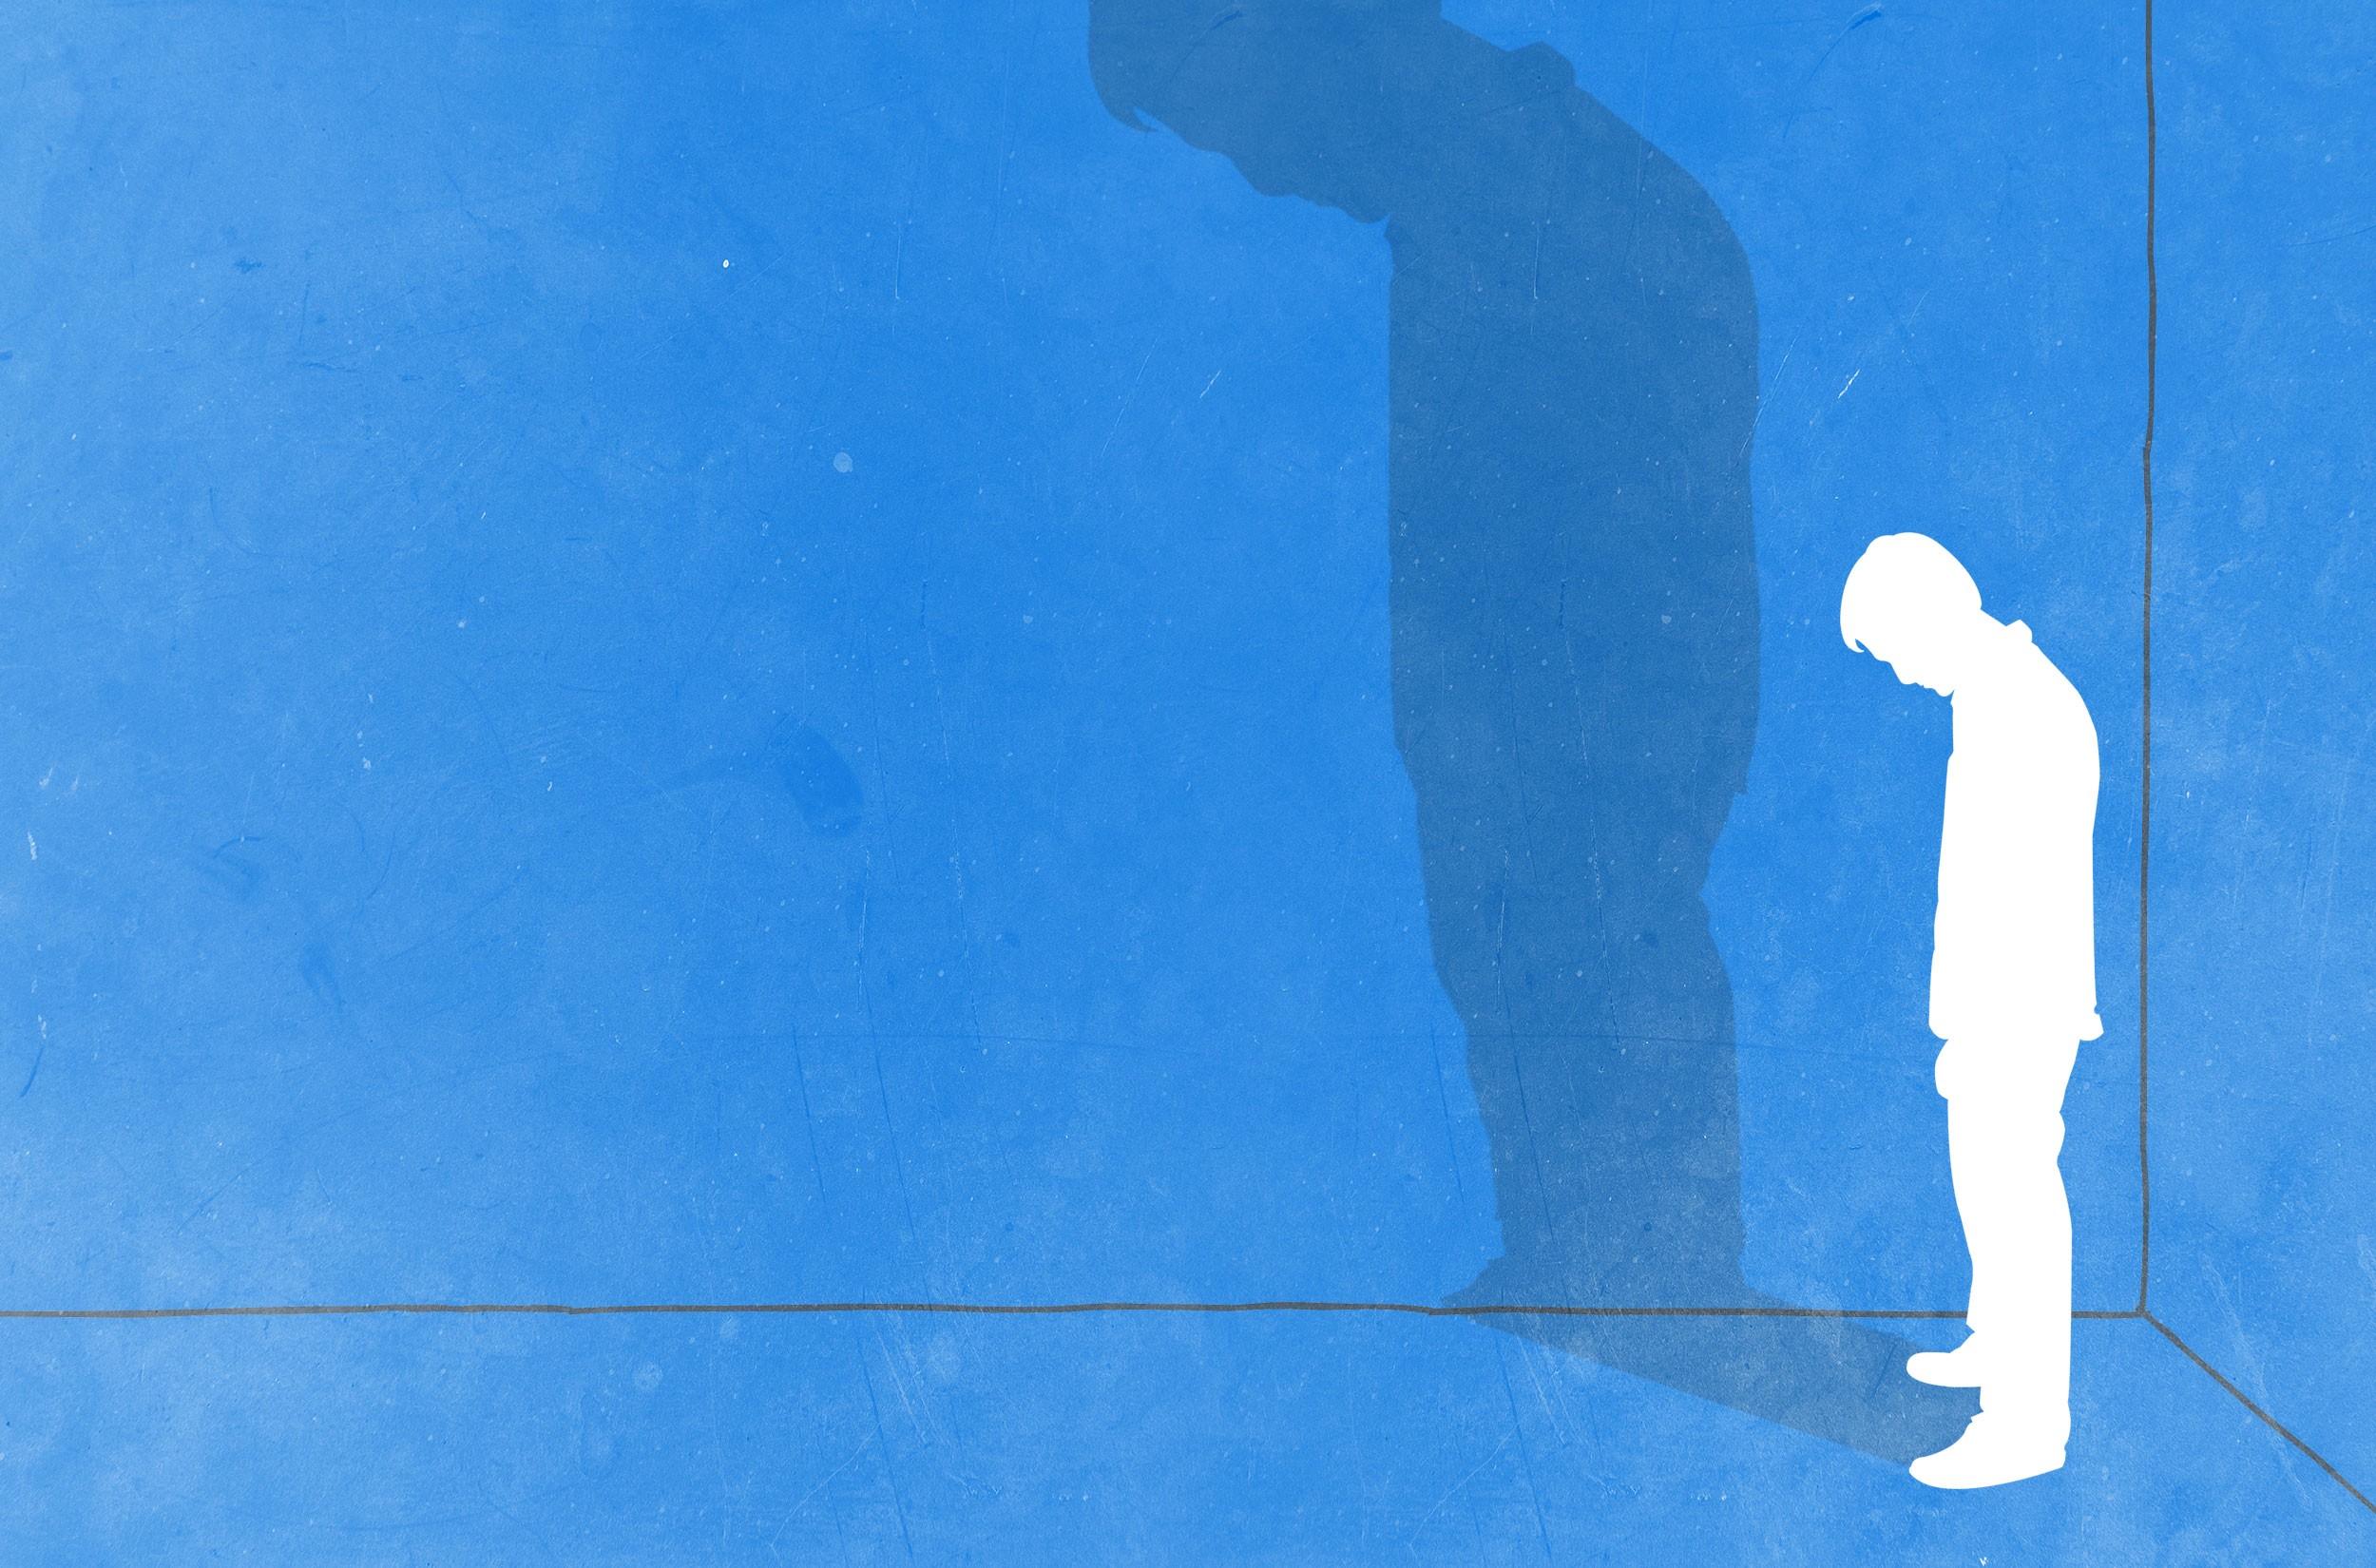 (Getty Images/Ringer illustration)